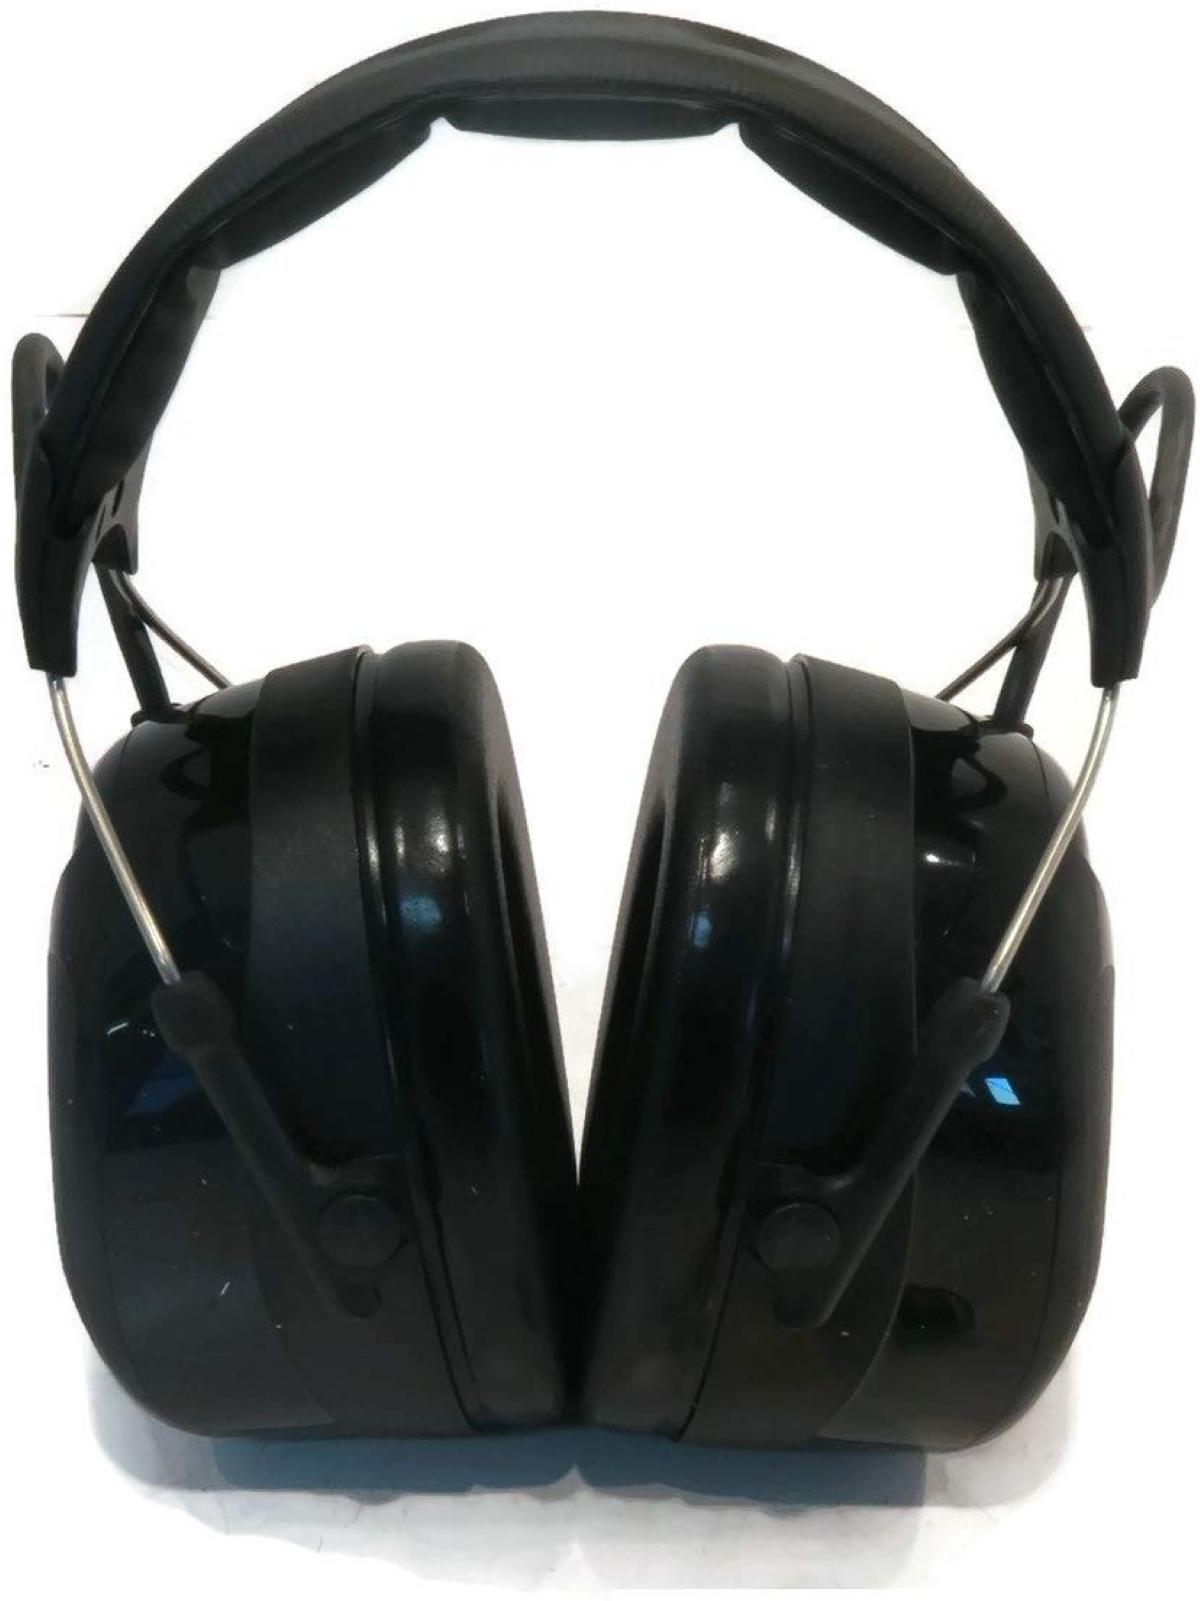 Peltor Radio Headset - Design